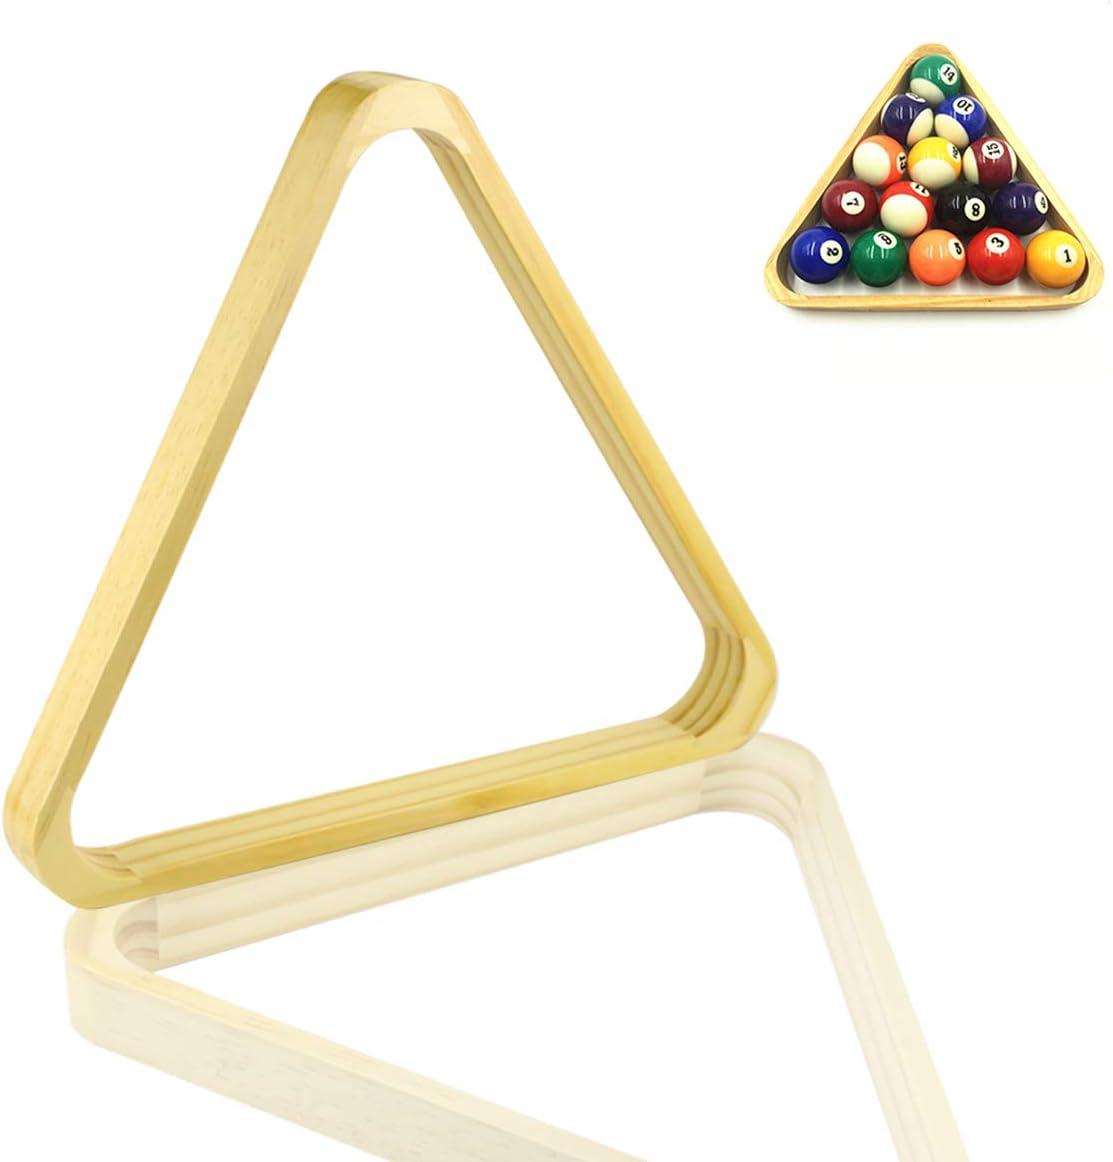 1.8//2//2.5inch Plastic Pool Ball Billiard Table Triangle Rack Game Equipment Tool